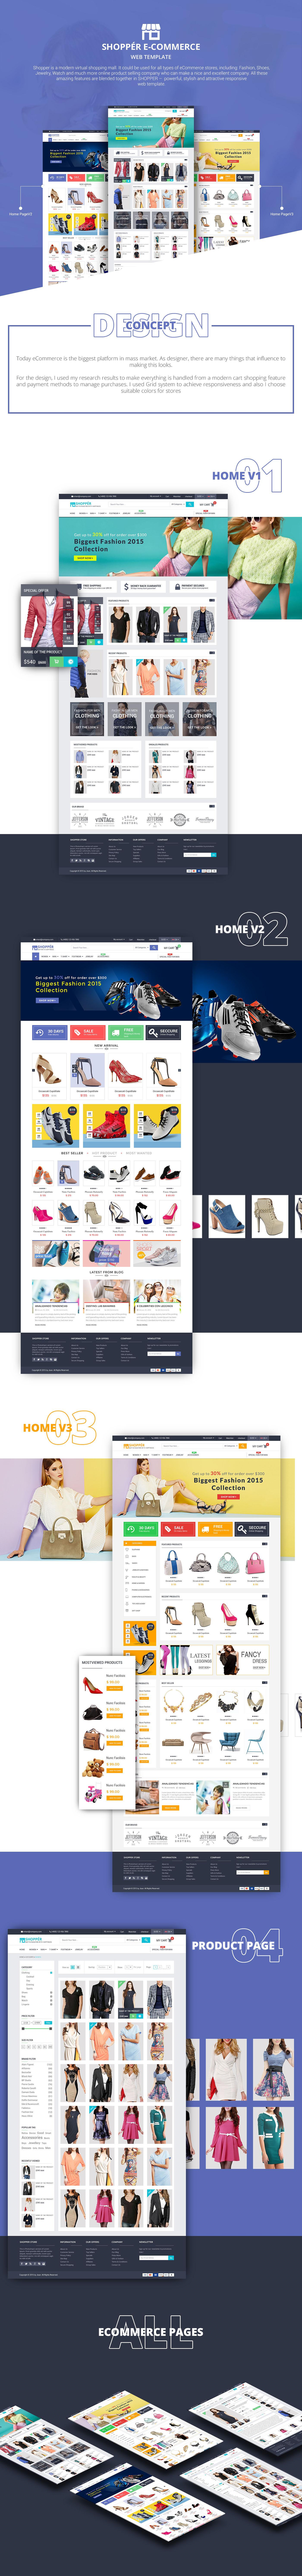 Shopper,Web,Ecommerce,fashionable,UI,interaction,communication,Usability,UCD,information,user experience,user interface,e-commerce,Website,design